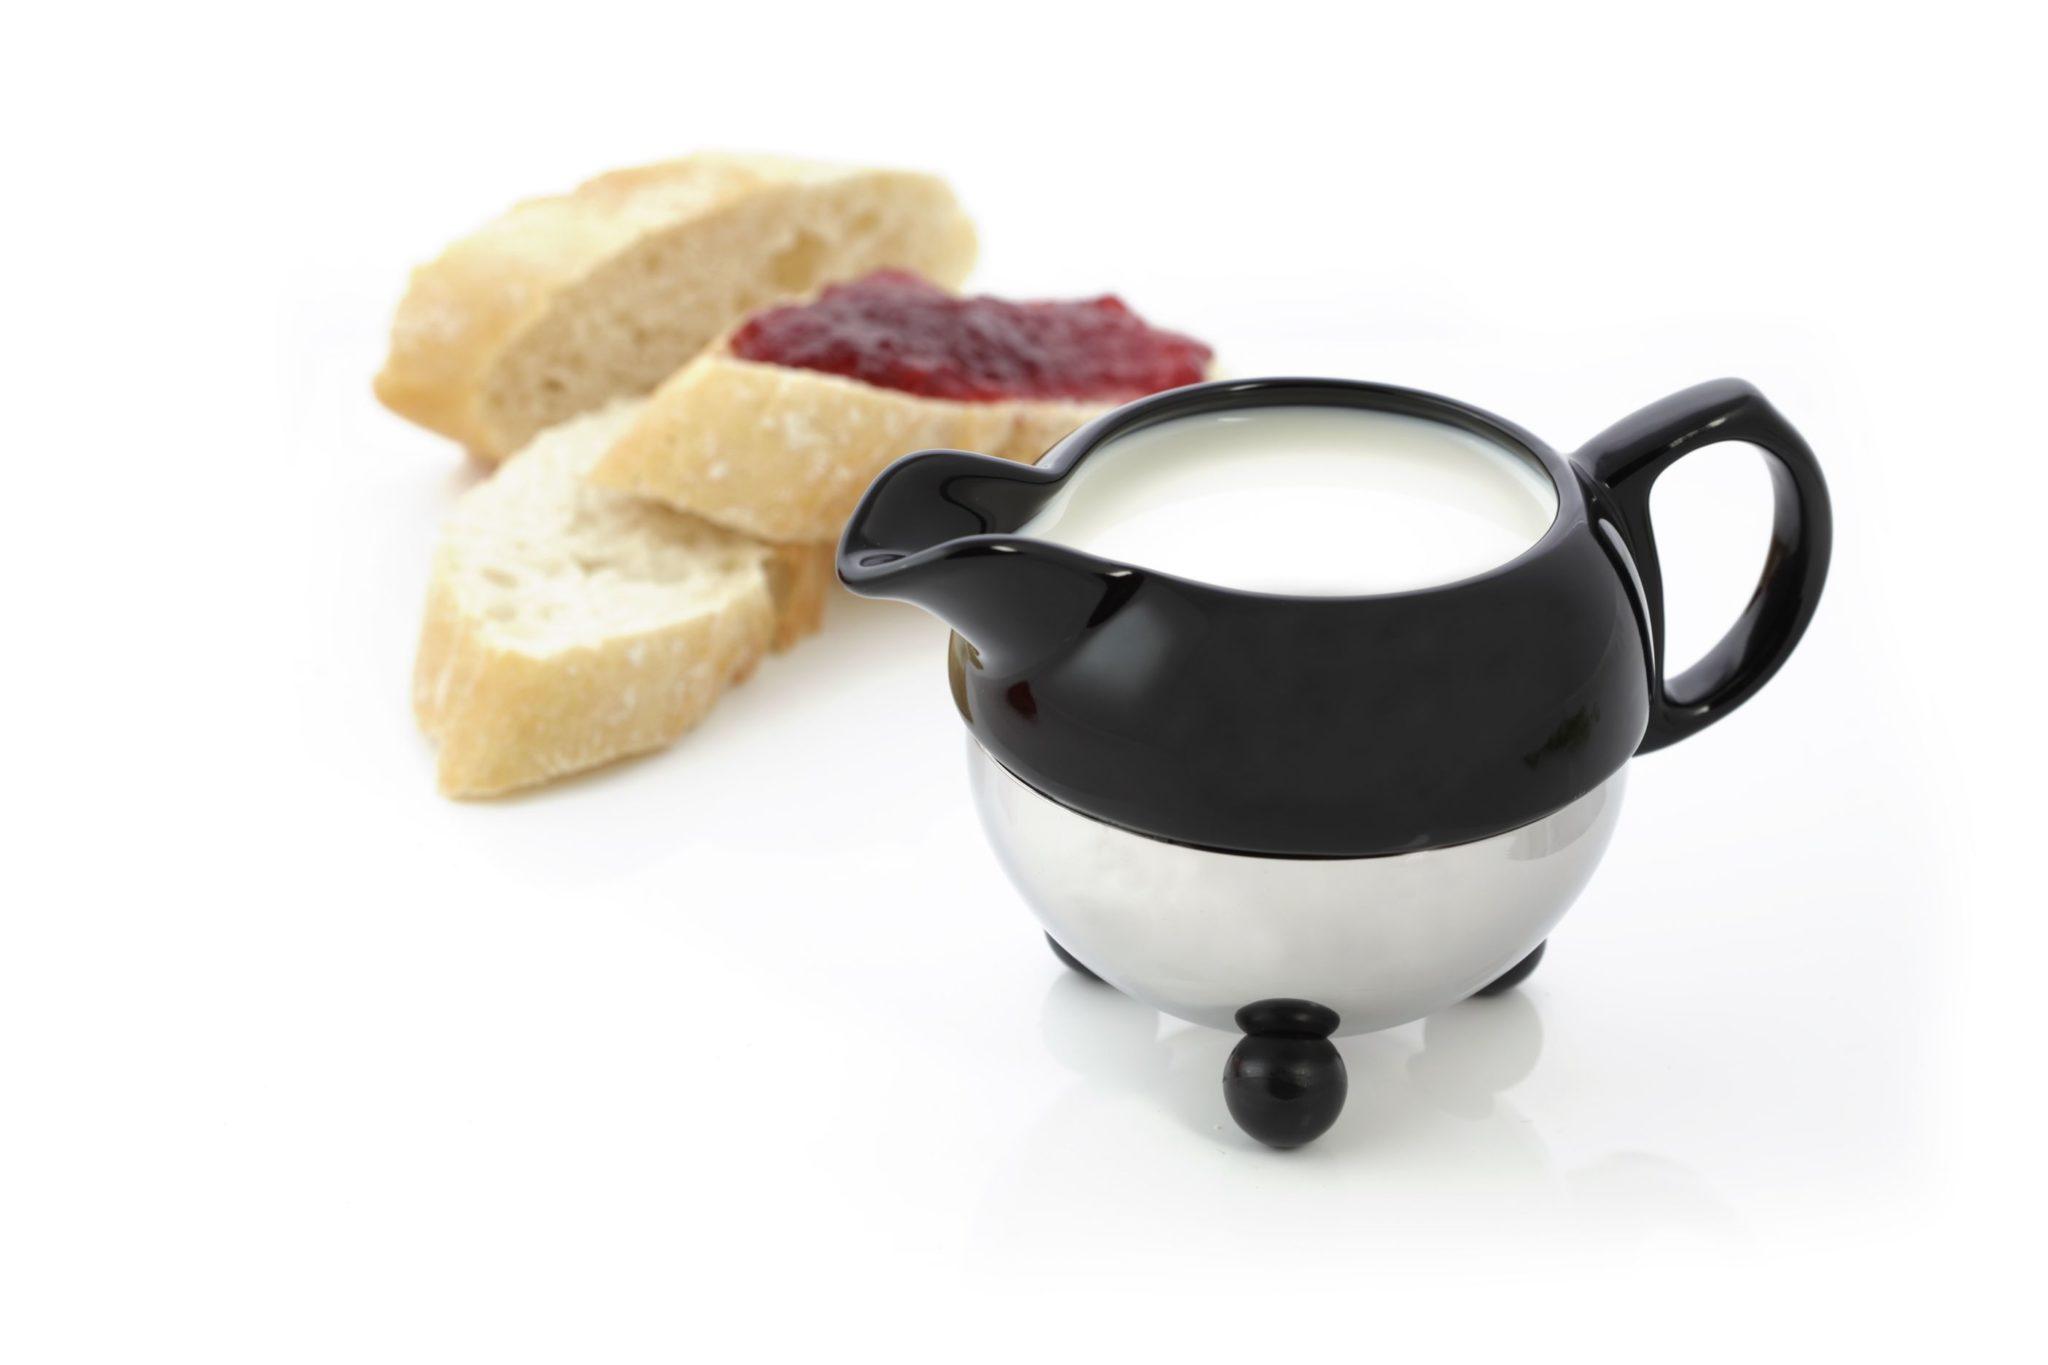 чайник санни плантейшн